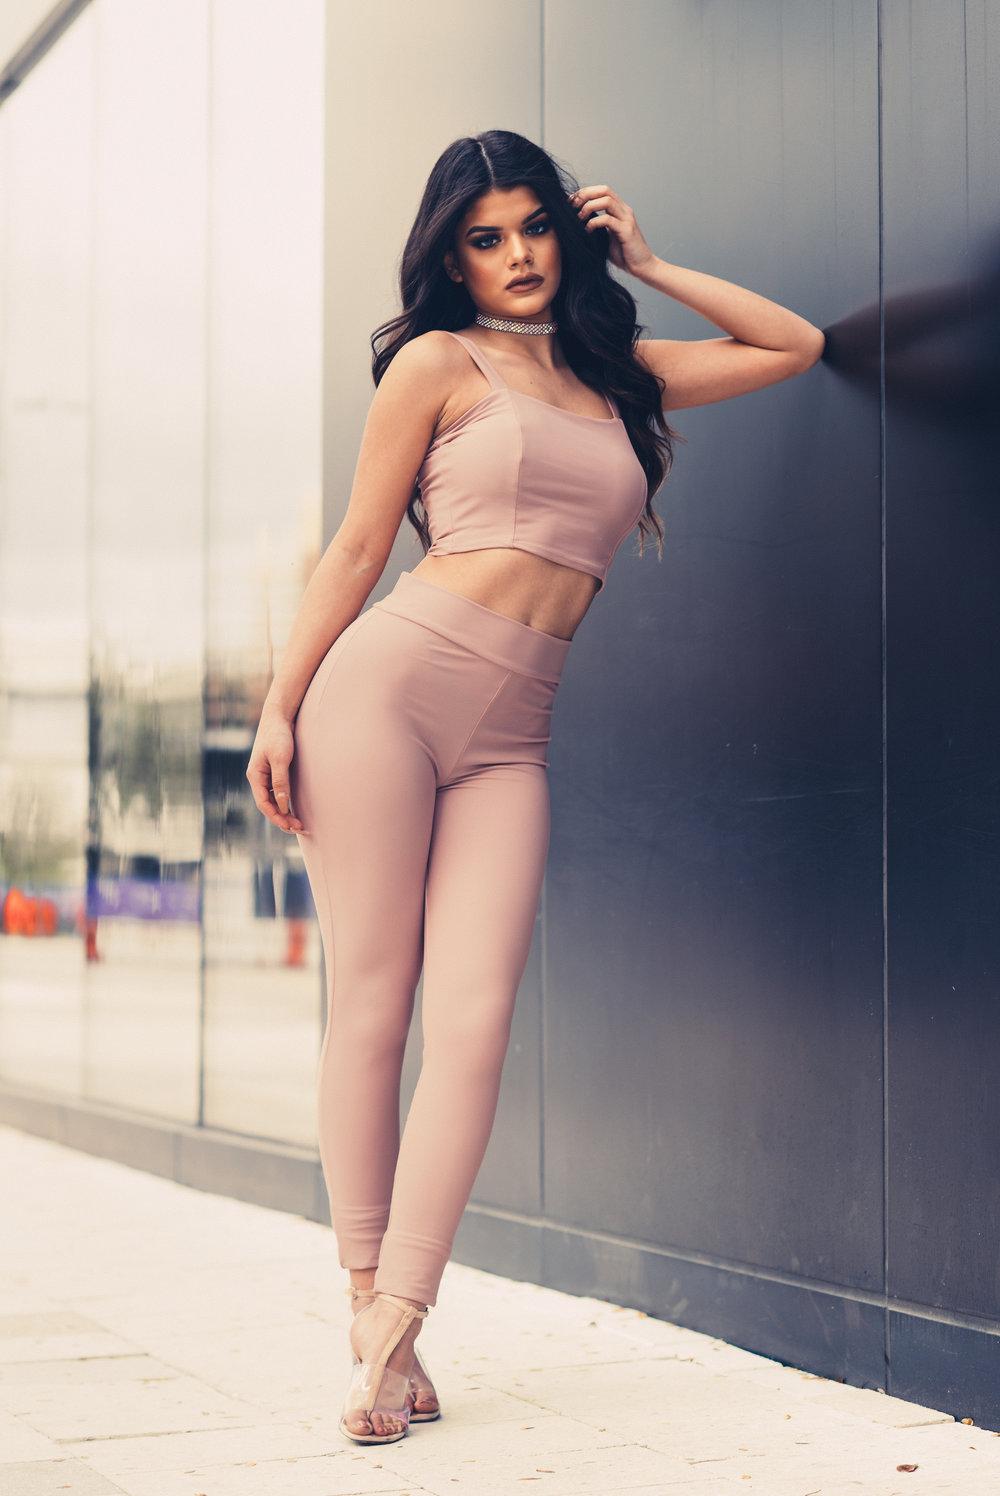 HARRIET: Perfect skinny ass